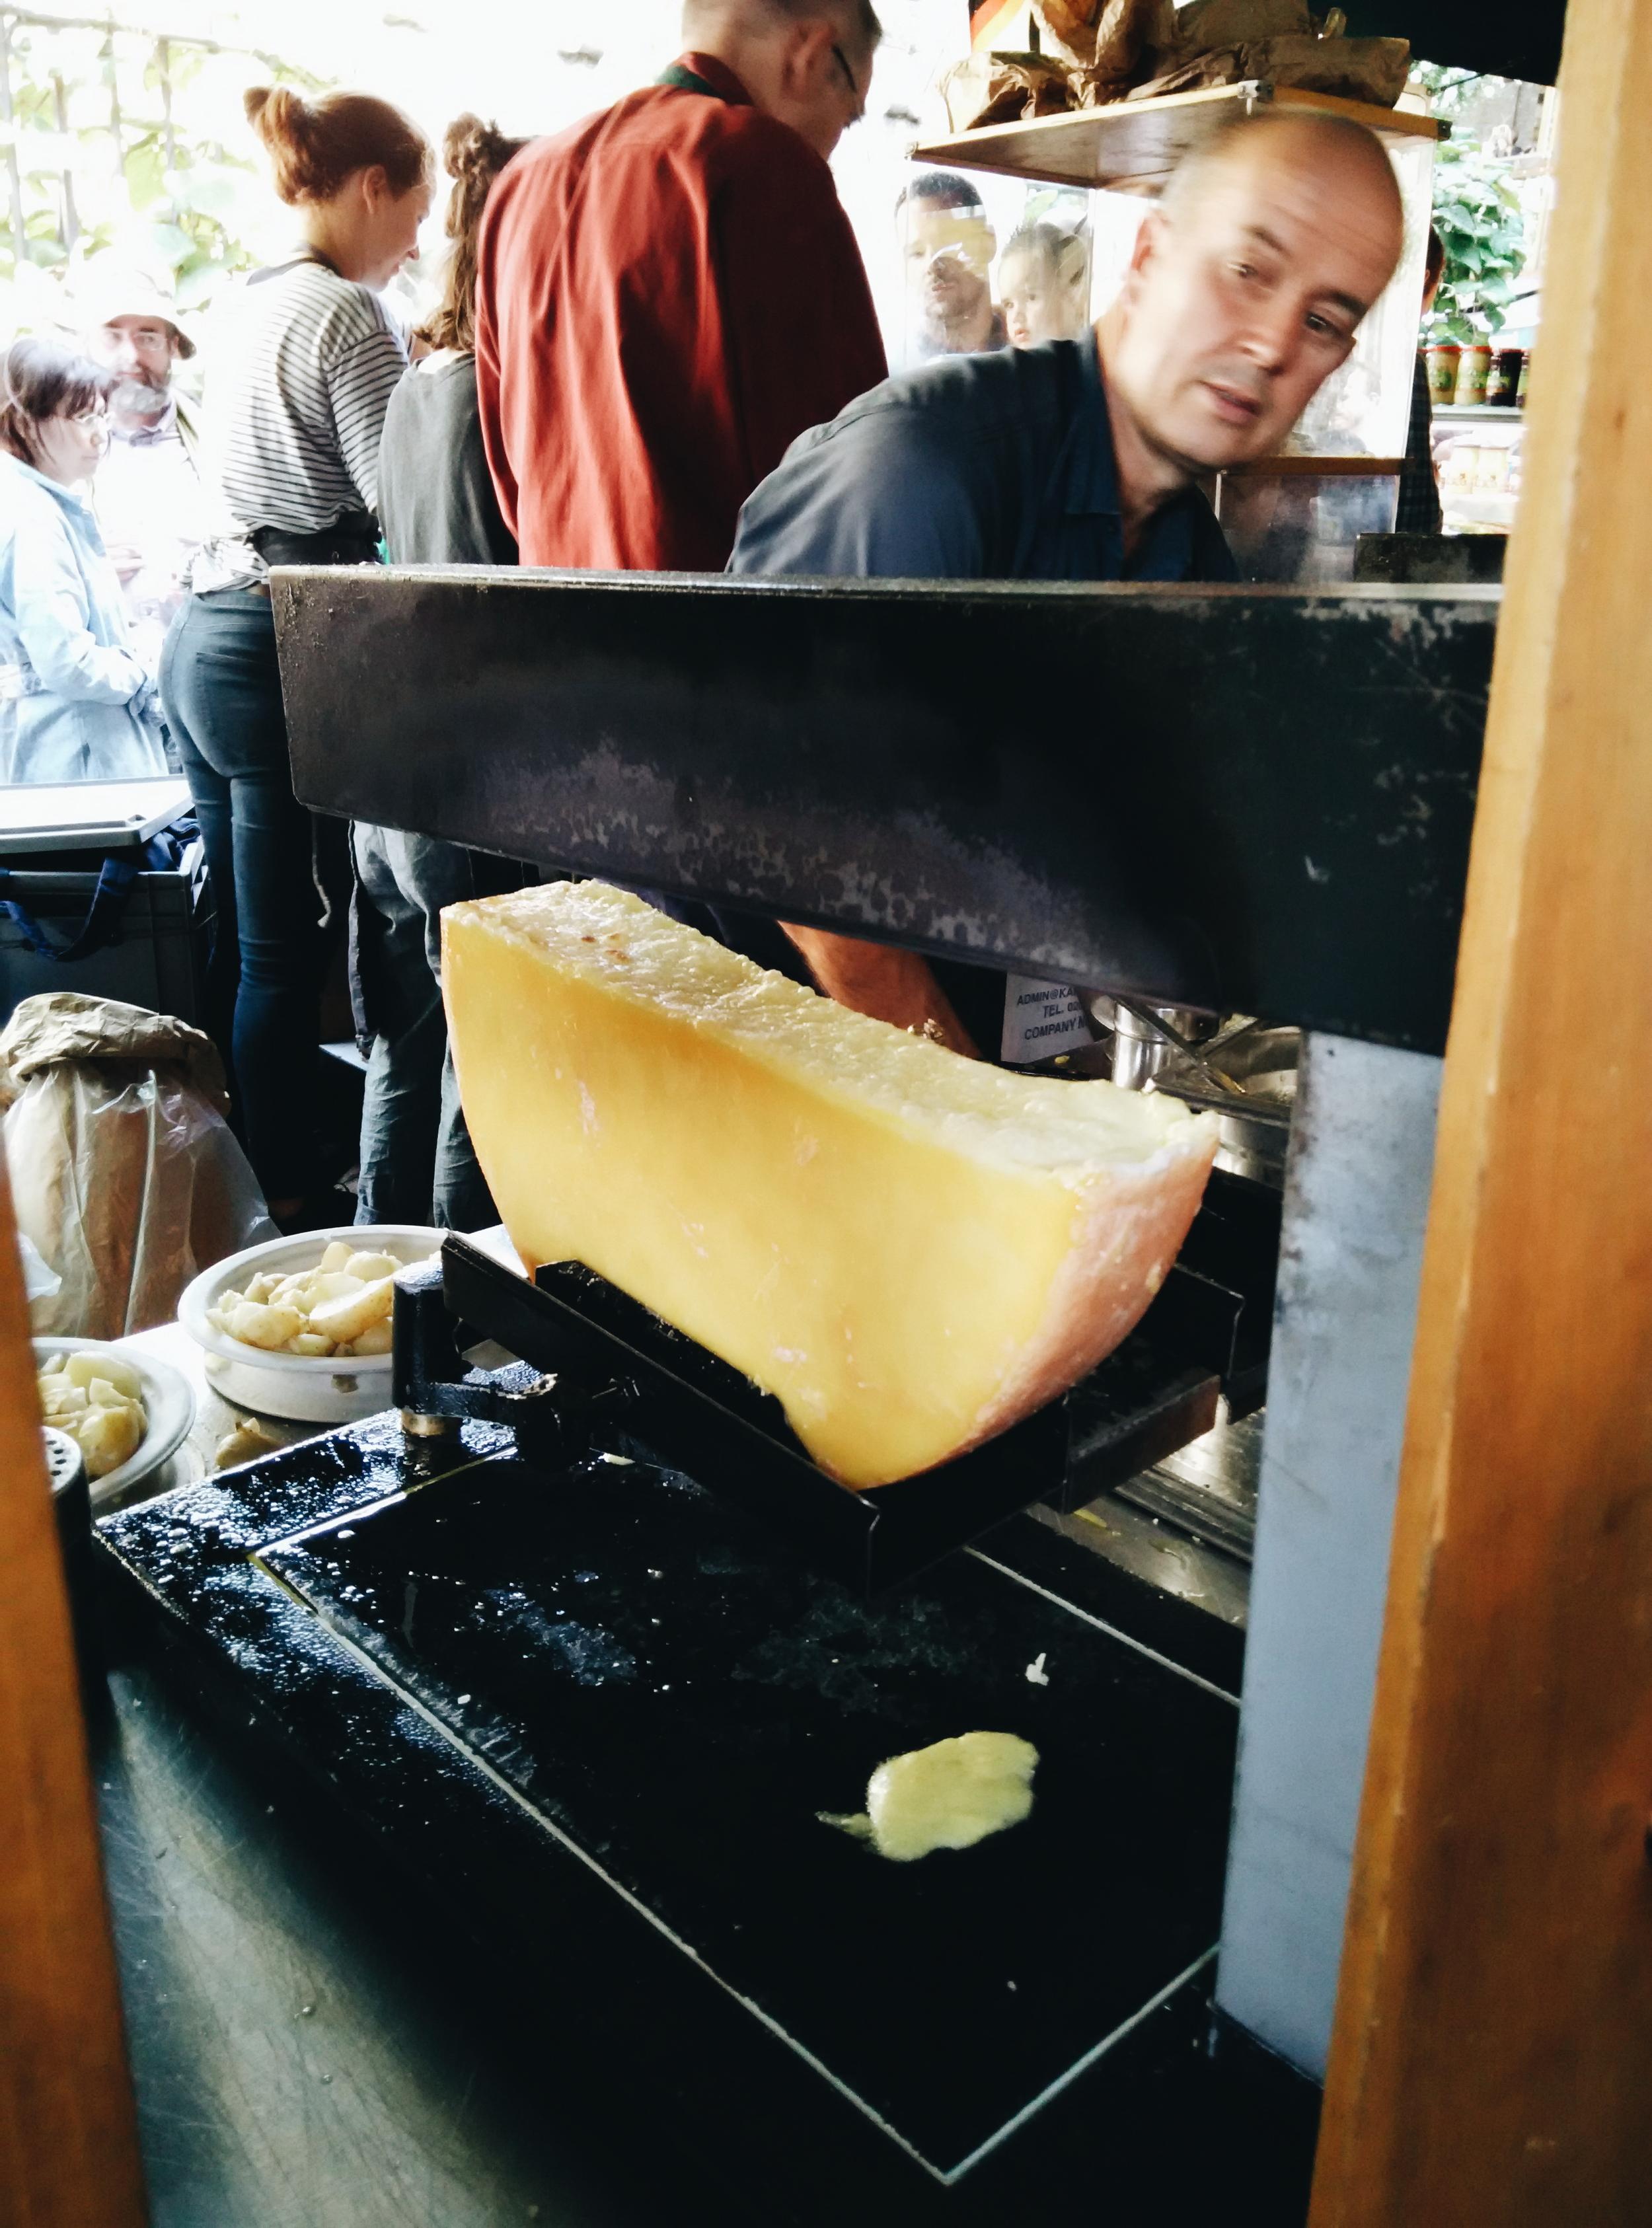 XXXL Grilled Cheese